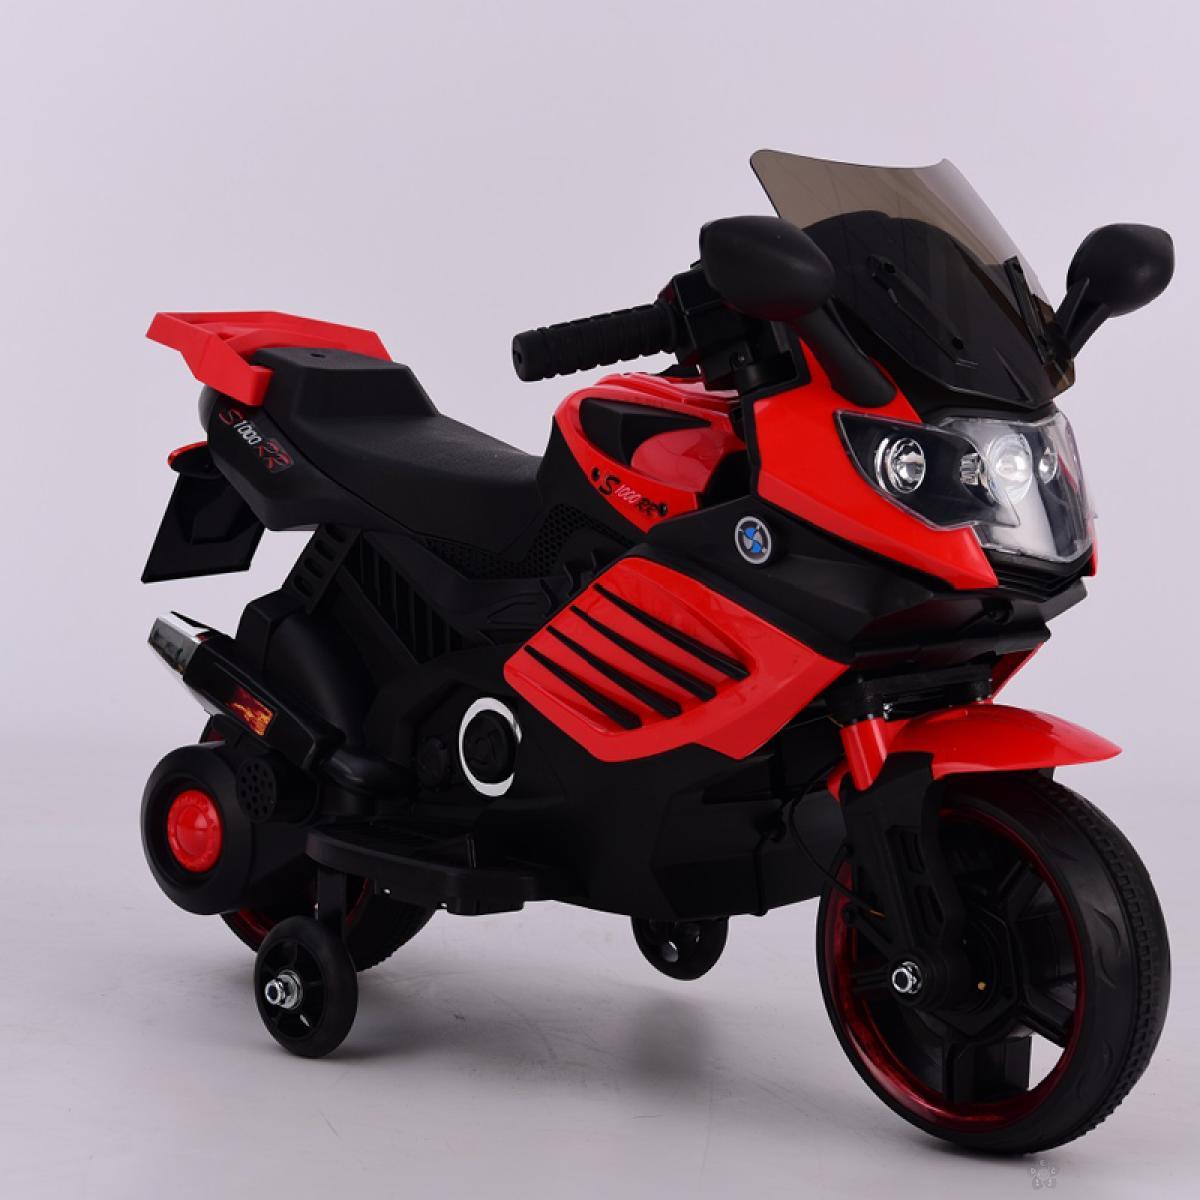 Motor na akumulator, model 116 crveni